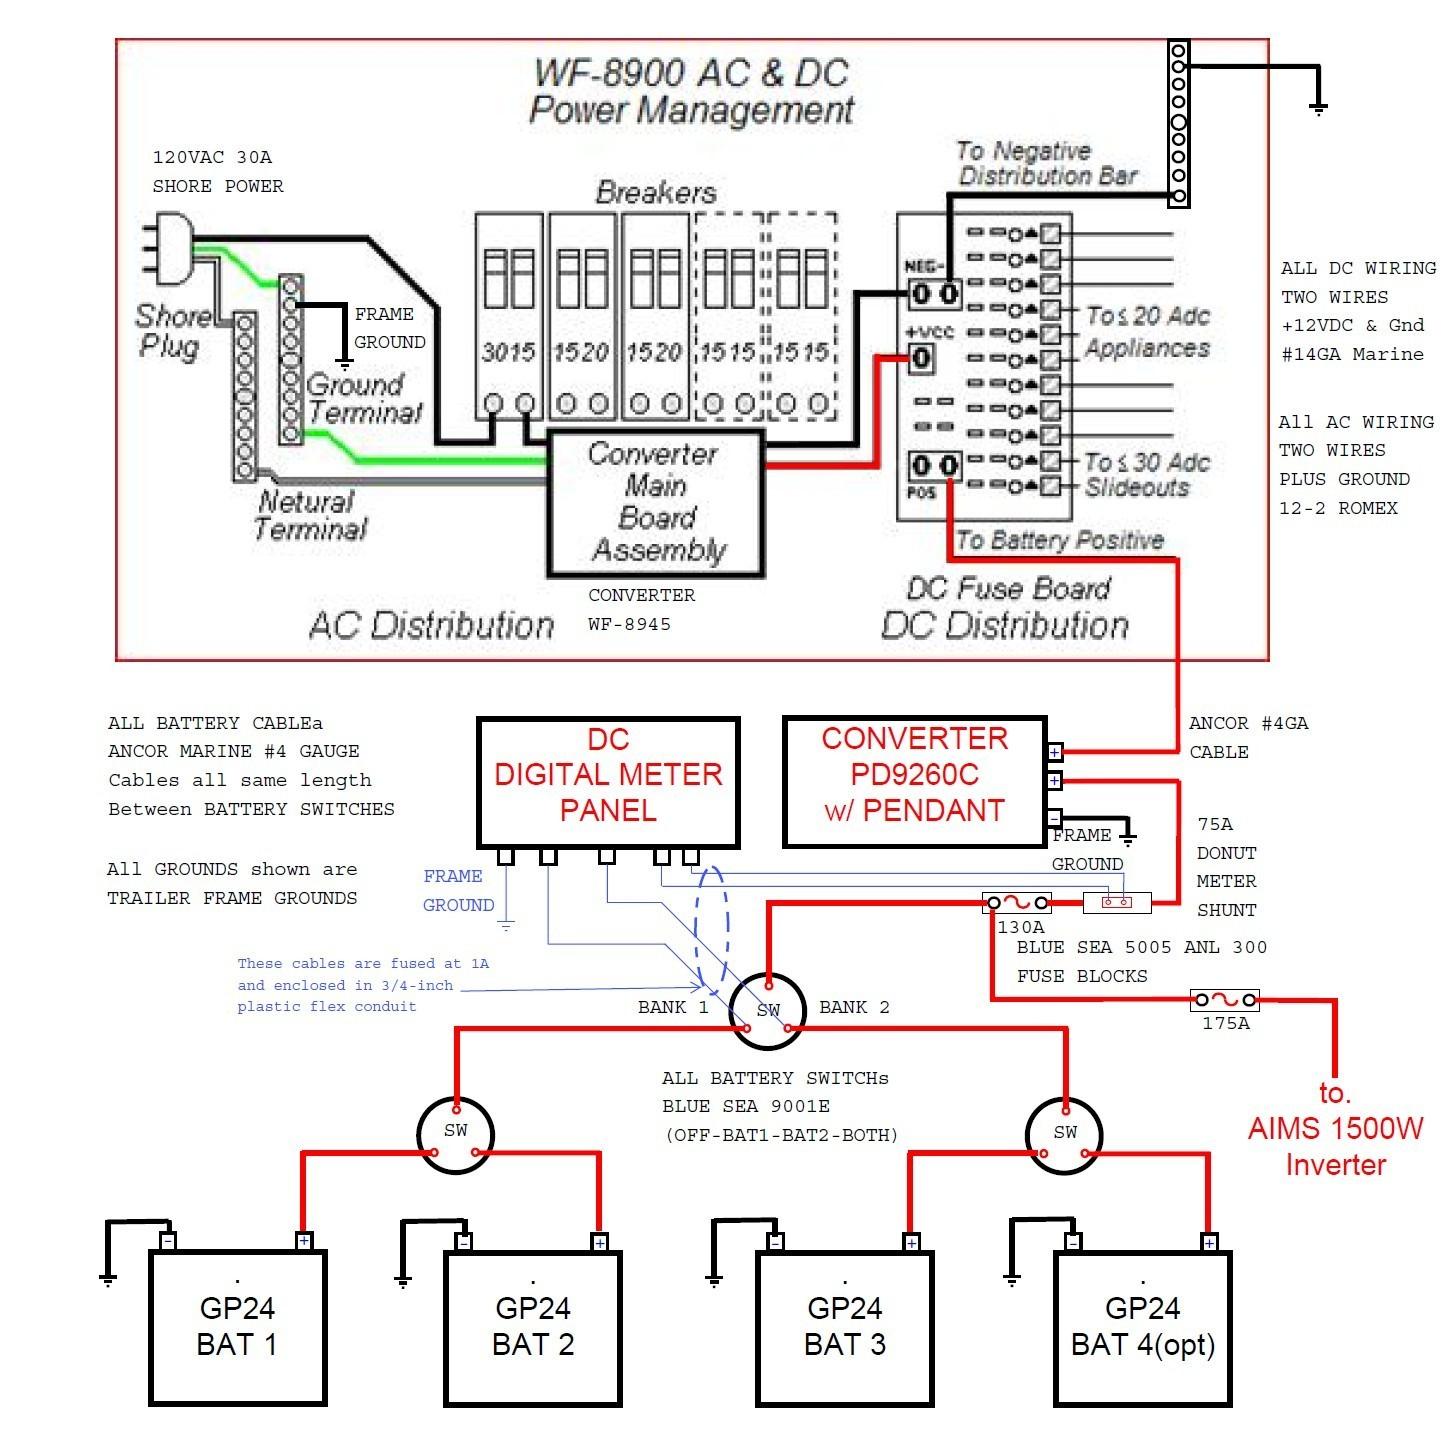 Wiring Diagram Starcraft Boat | Wiring Diagram on